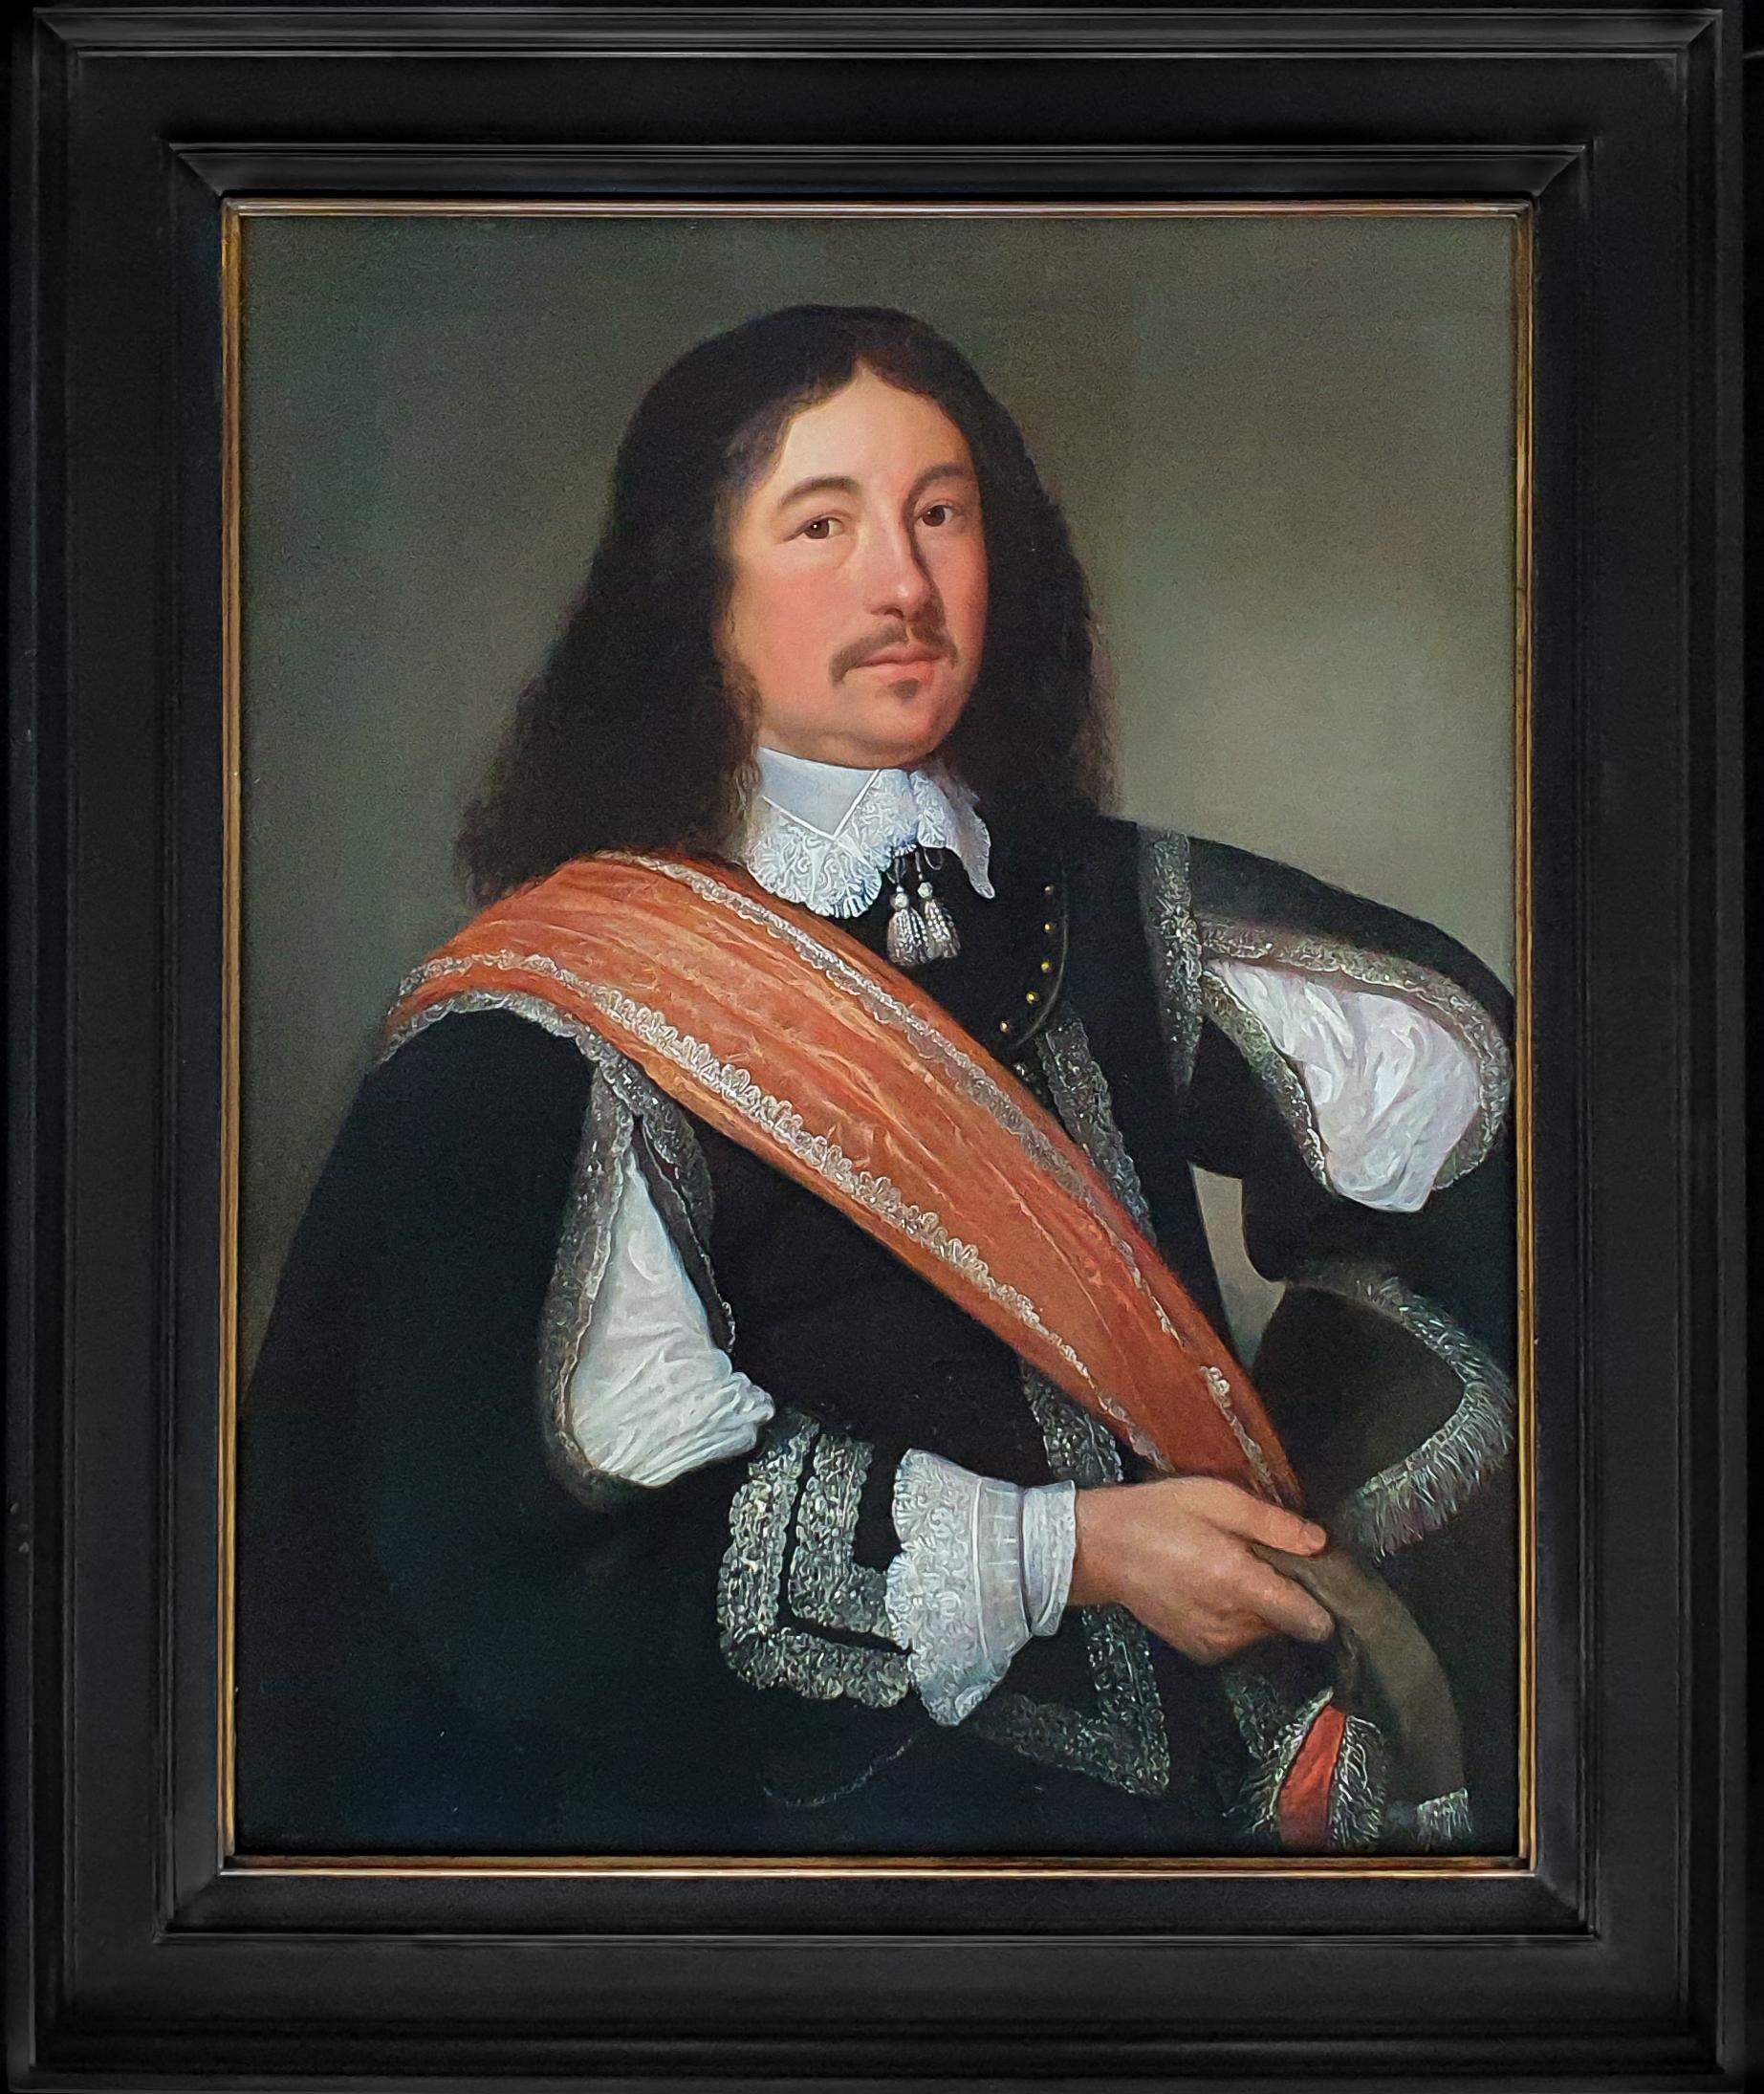 Portrait of a Gentleman with a Black Slashed Doublet and Orange Sash c.1650